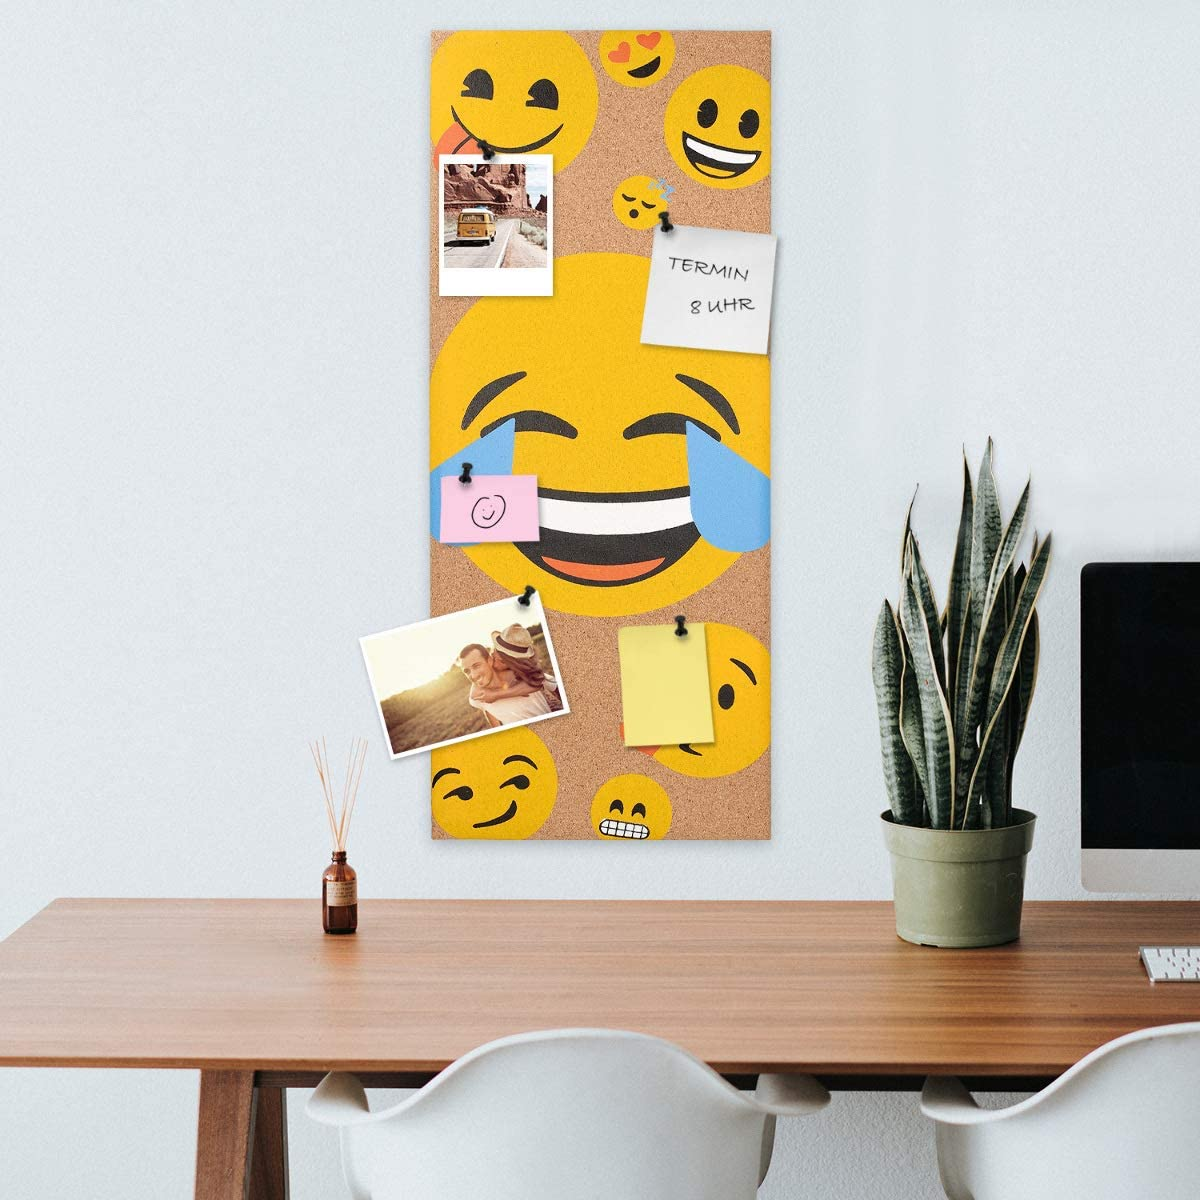 Bedroom Home Office Navaris Cork Bulletin Board Classroom 40 x 40 cm Push Pin Memo Corkboard in Deer Design with Push Pins for Kitchen